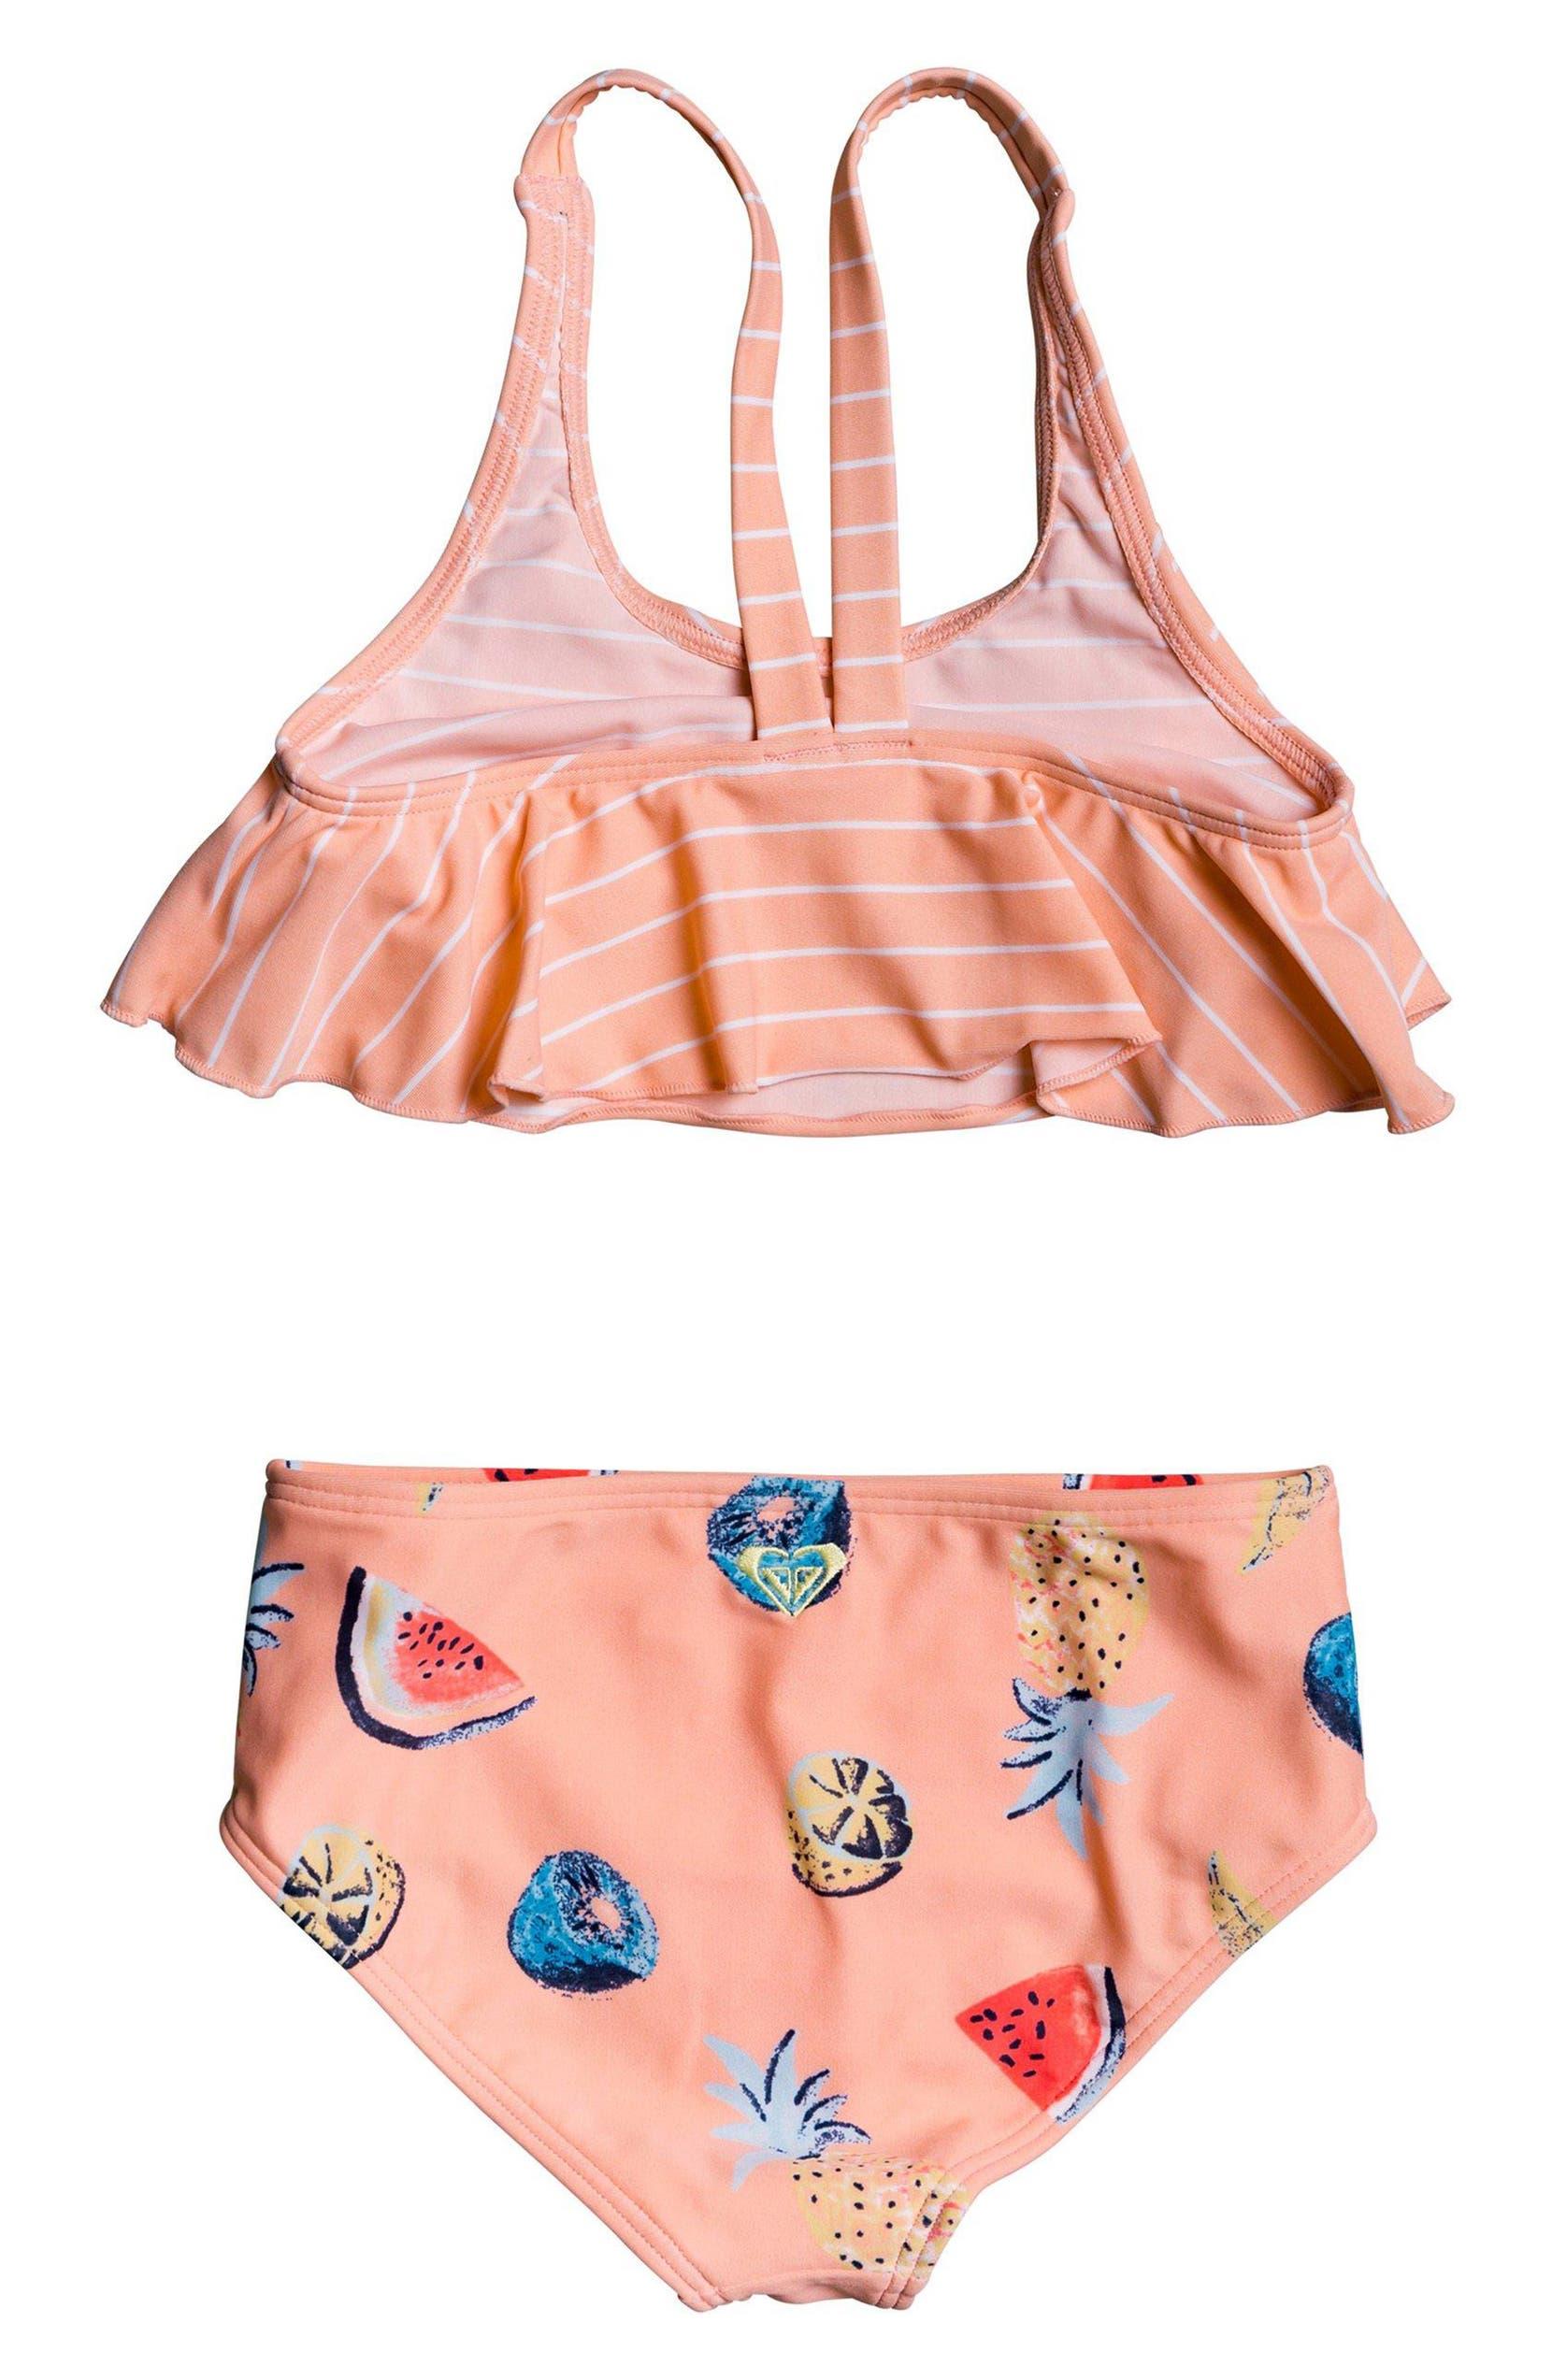 c64929d9d2118 Roxy Splashing You Flutter Two-Piece Swimsuit (Toddler Girls & Little  Girls) | Nordstrom